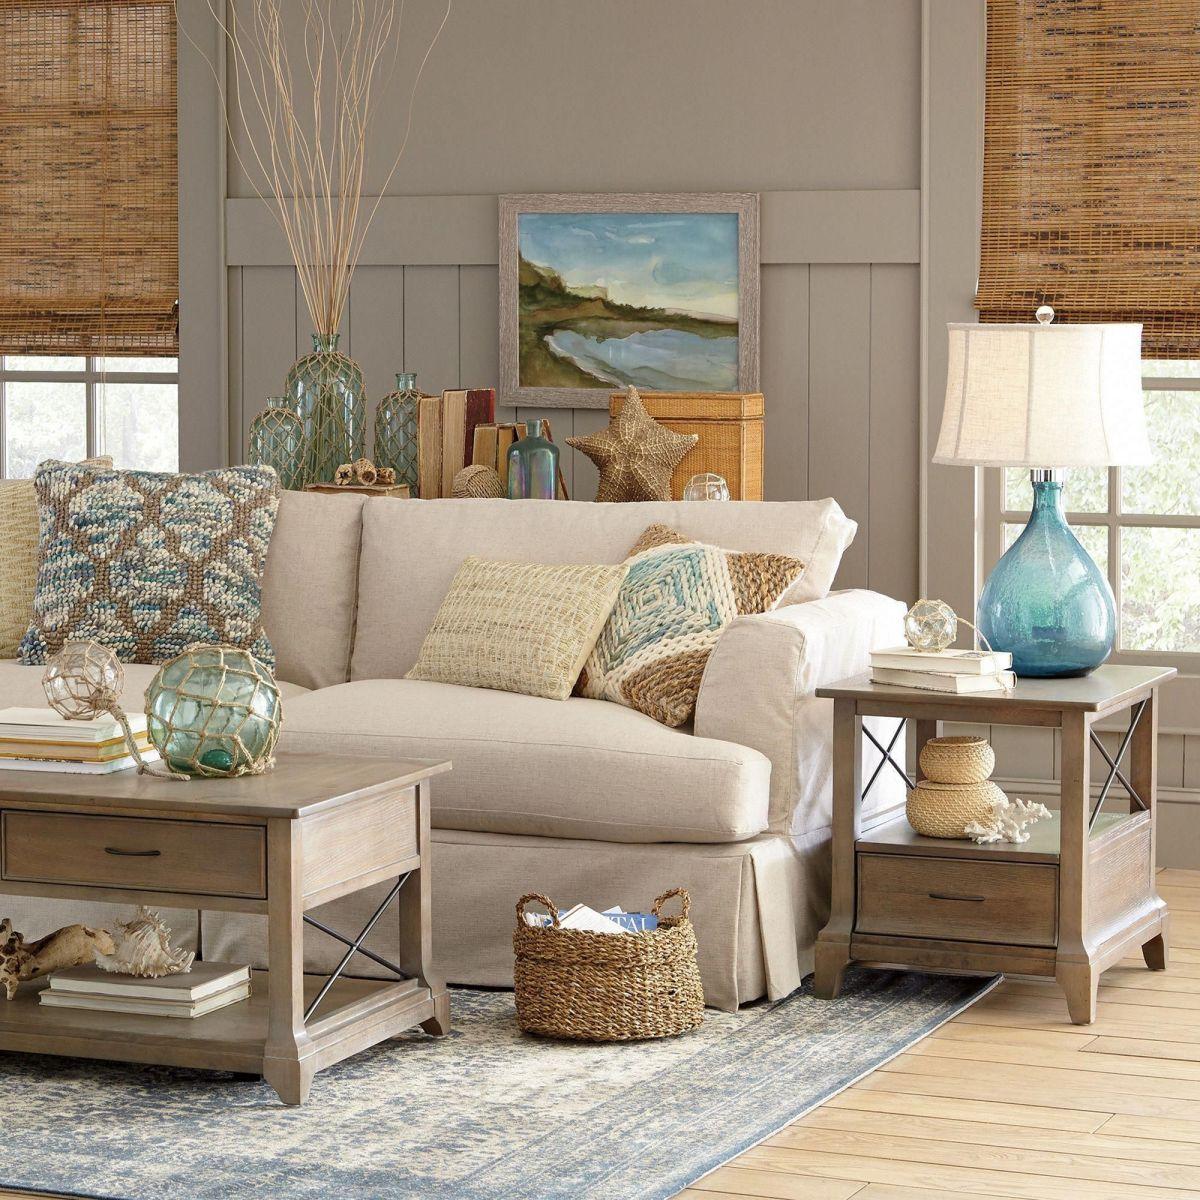 Beach Home Interior Design Ideas: 12 Fascinating Beach Coastal Living Room Design Ideas That